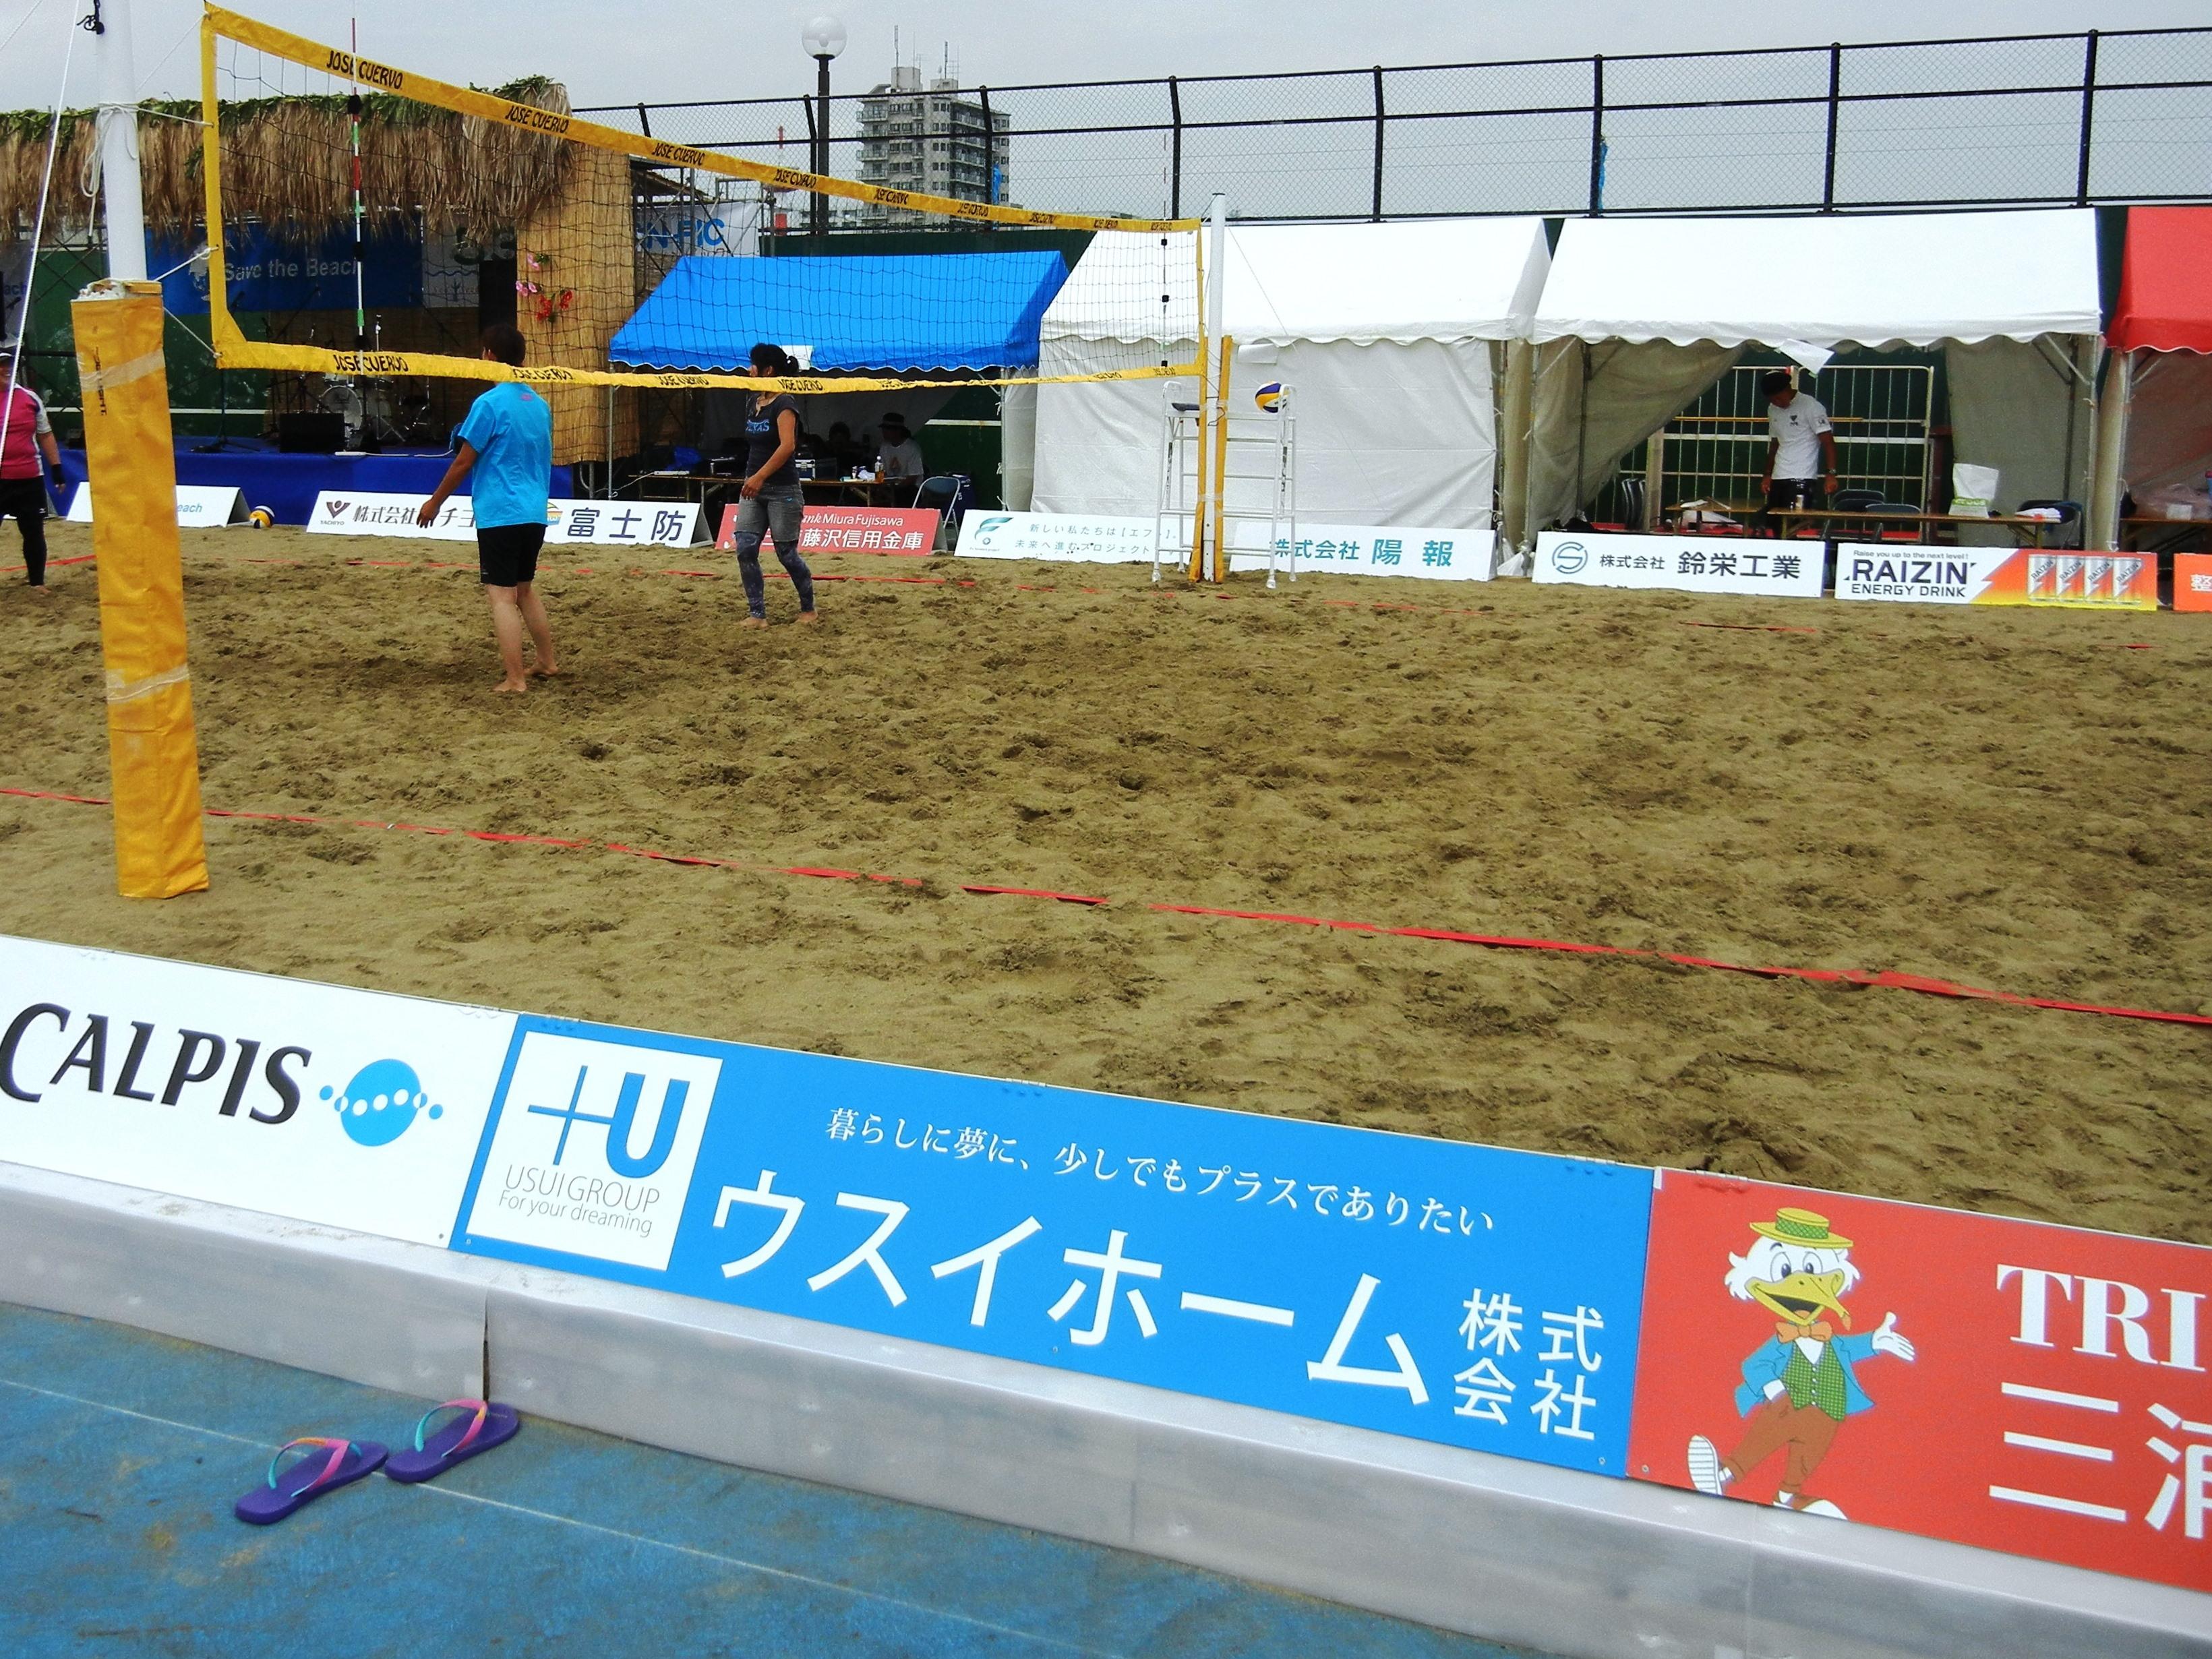 save-the-beach-in-yokosuka%e5%8d%94%e8%b3%9b